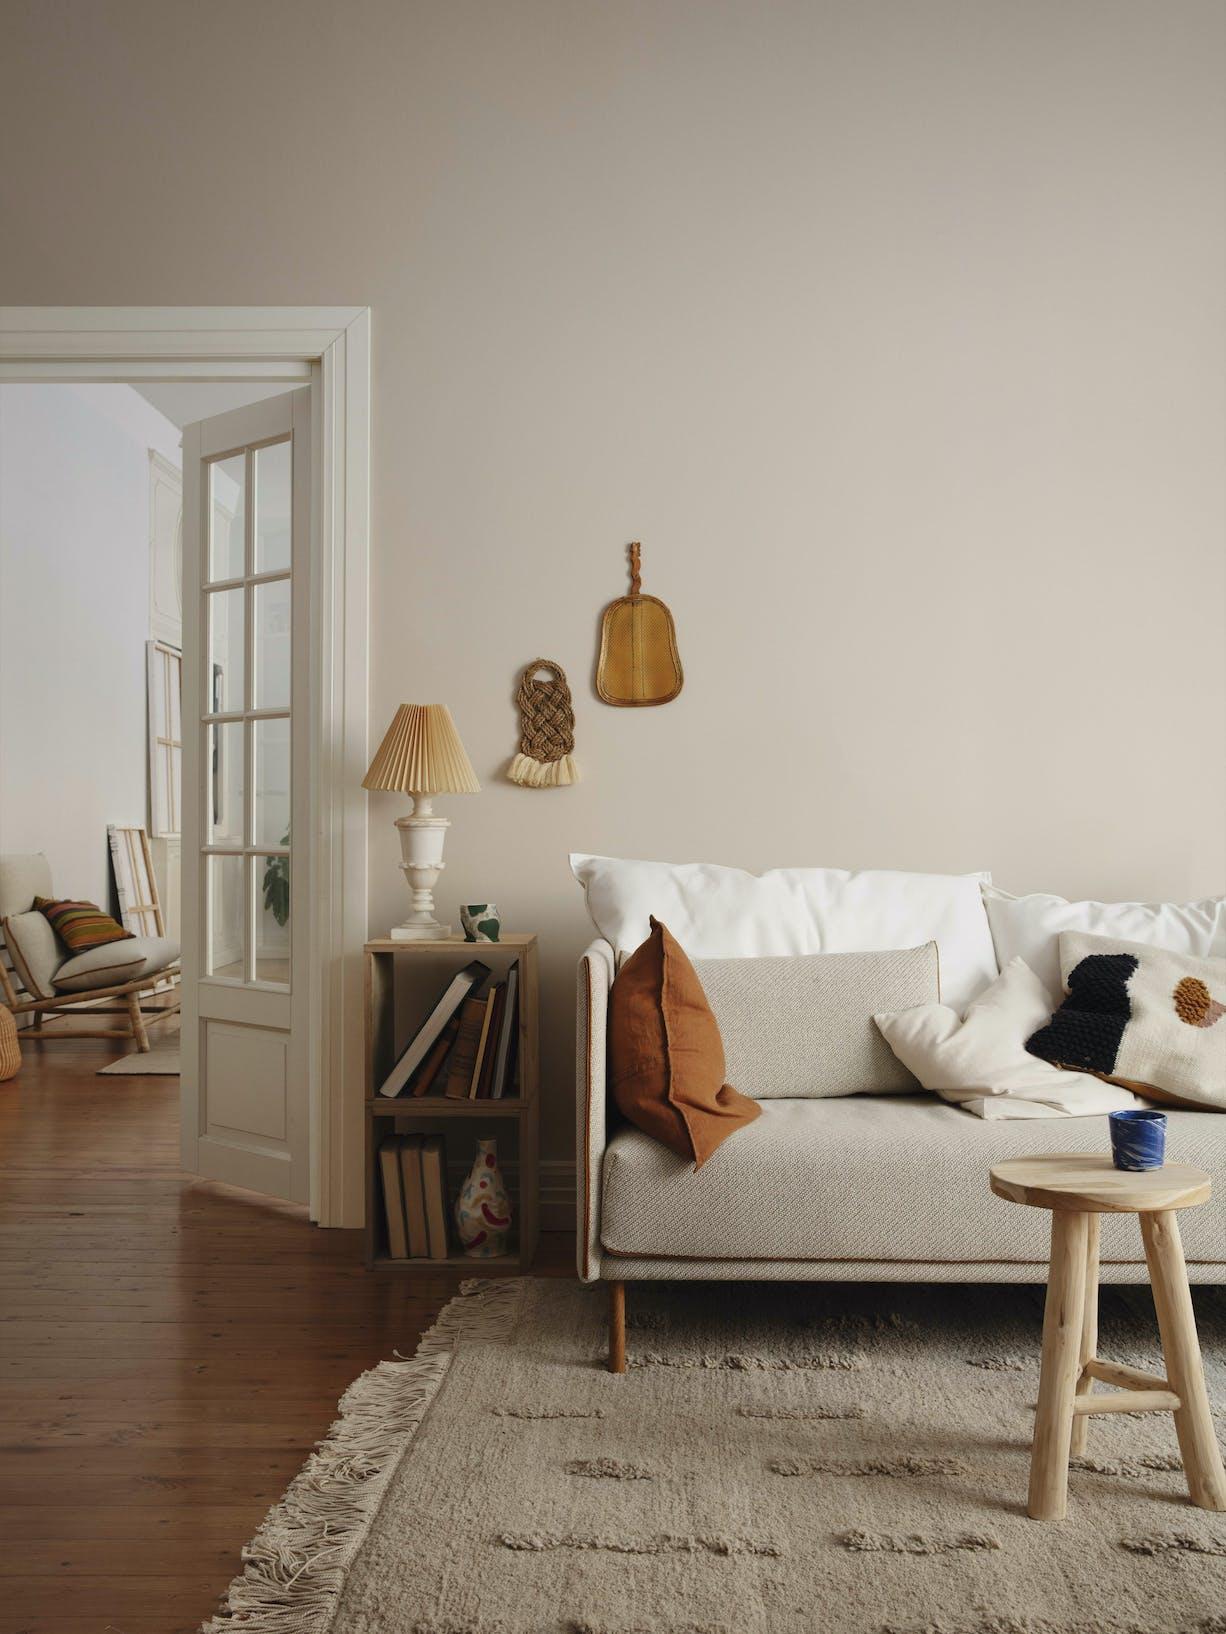 Interior Colour Mood: Balanced Beige - Tikkurila Beige - Left Body Image